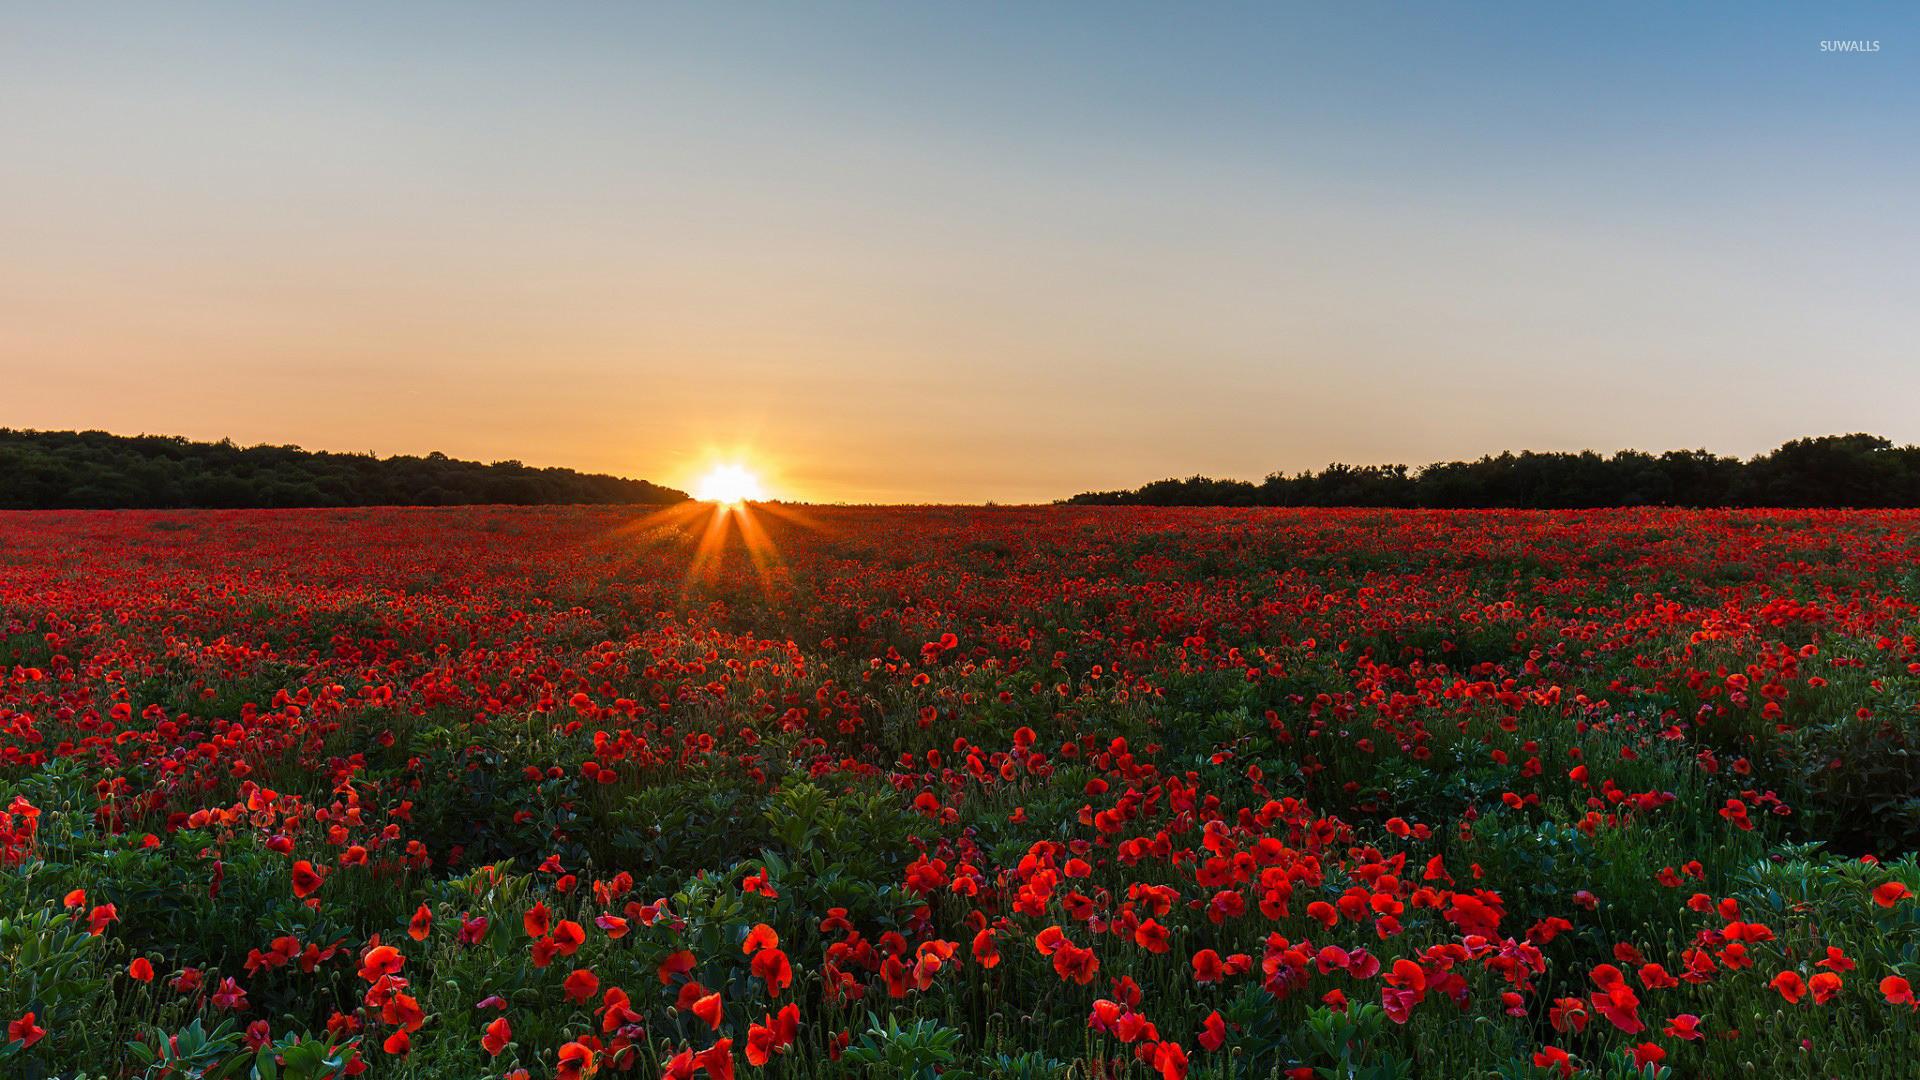 Poppy field at sunrise wallpaper